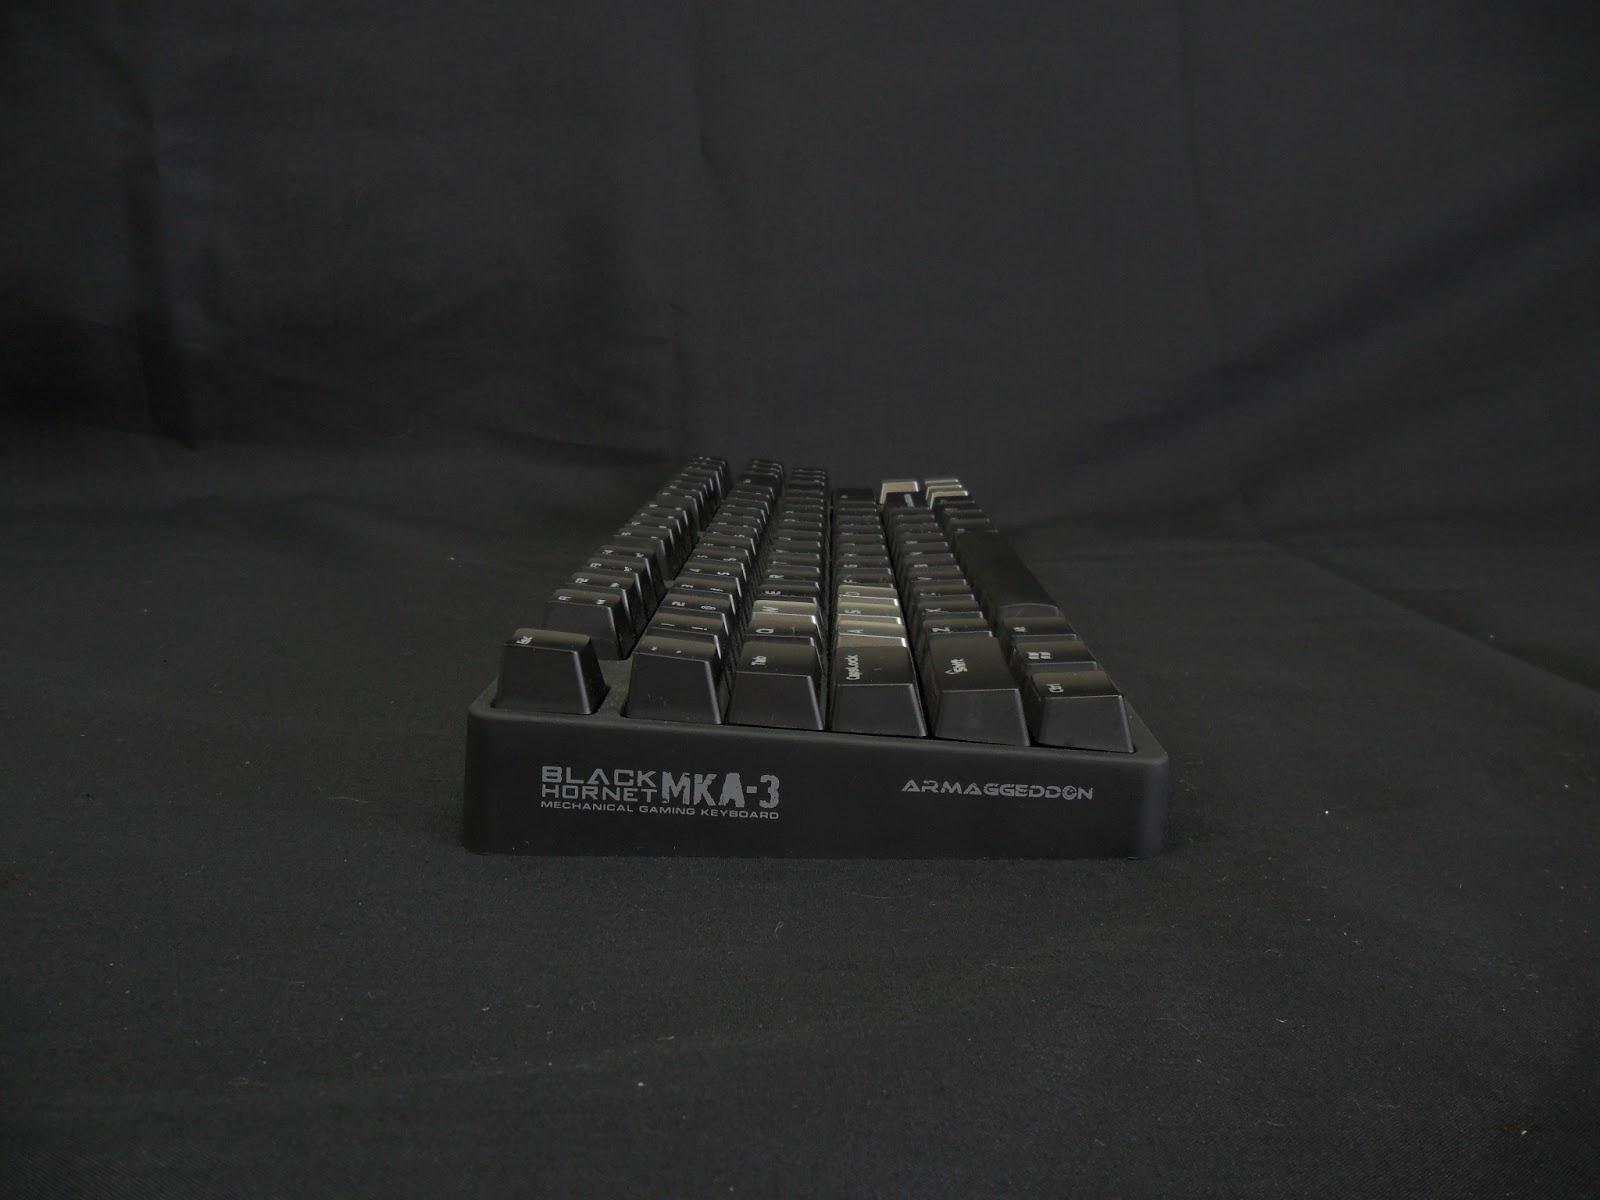 Unboxing & Review: Armaggeddon Black Hornet MKA-3 Mechanical Gaming Keyboard 8